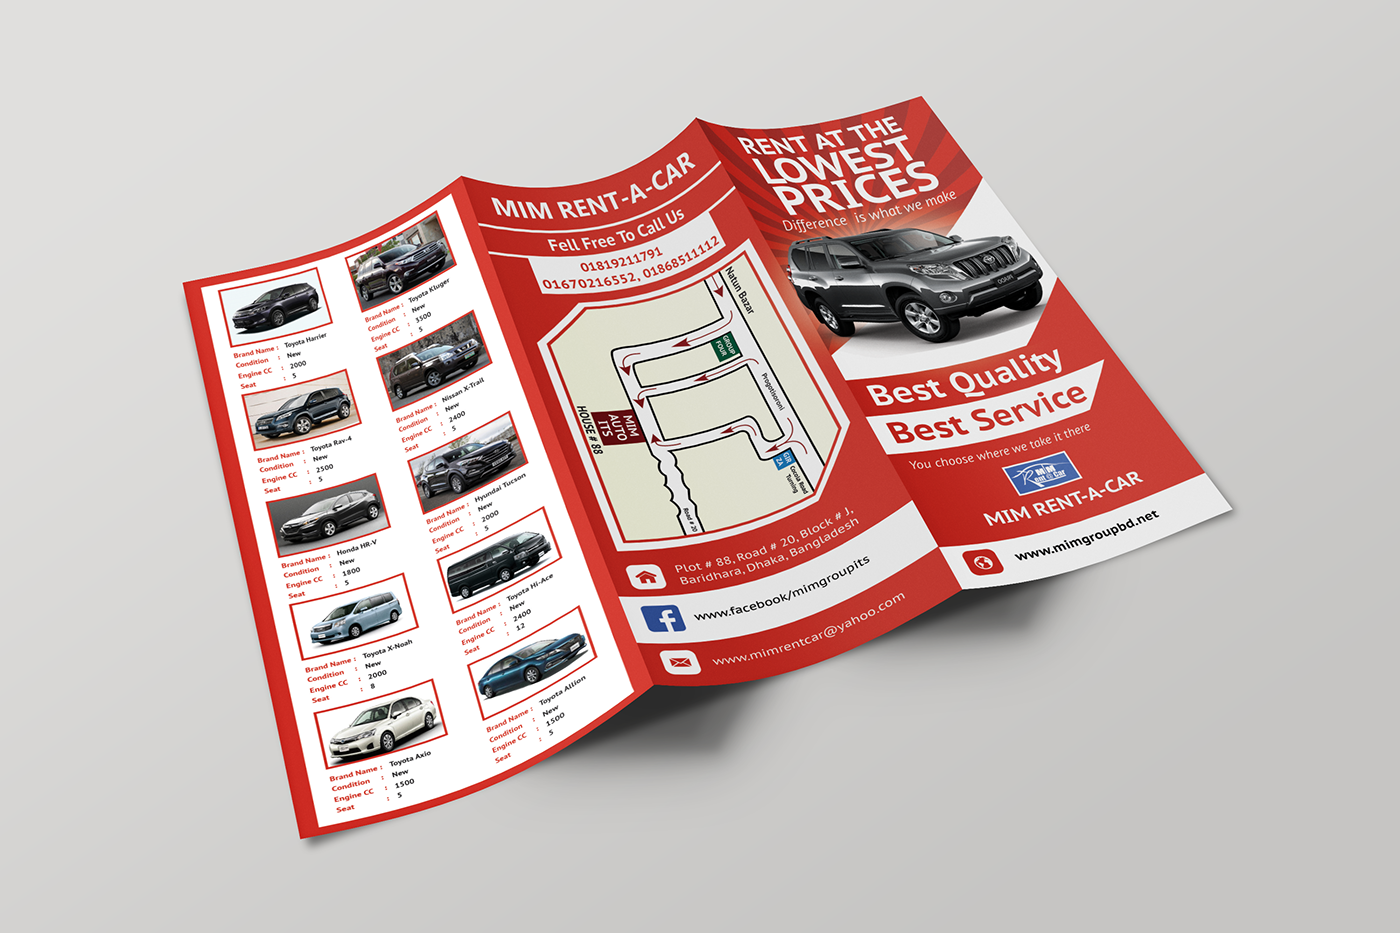 tri-fold brochure,print design ,flyer,creative,professional,magazine,simple,new,official,brochure